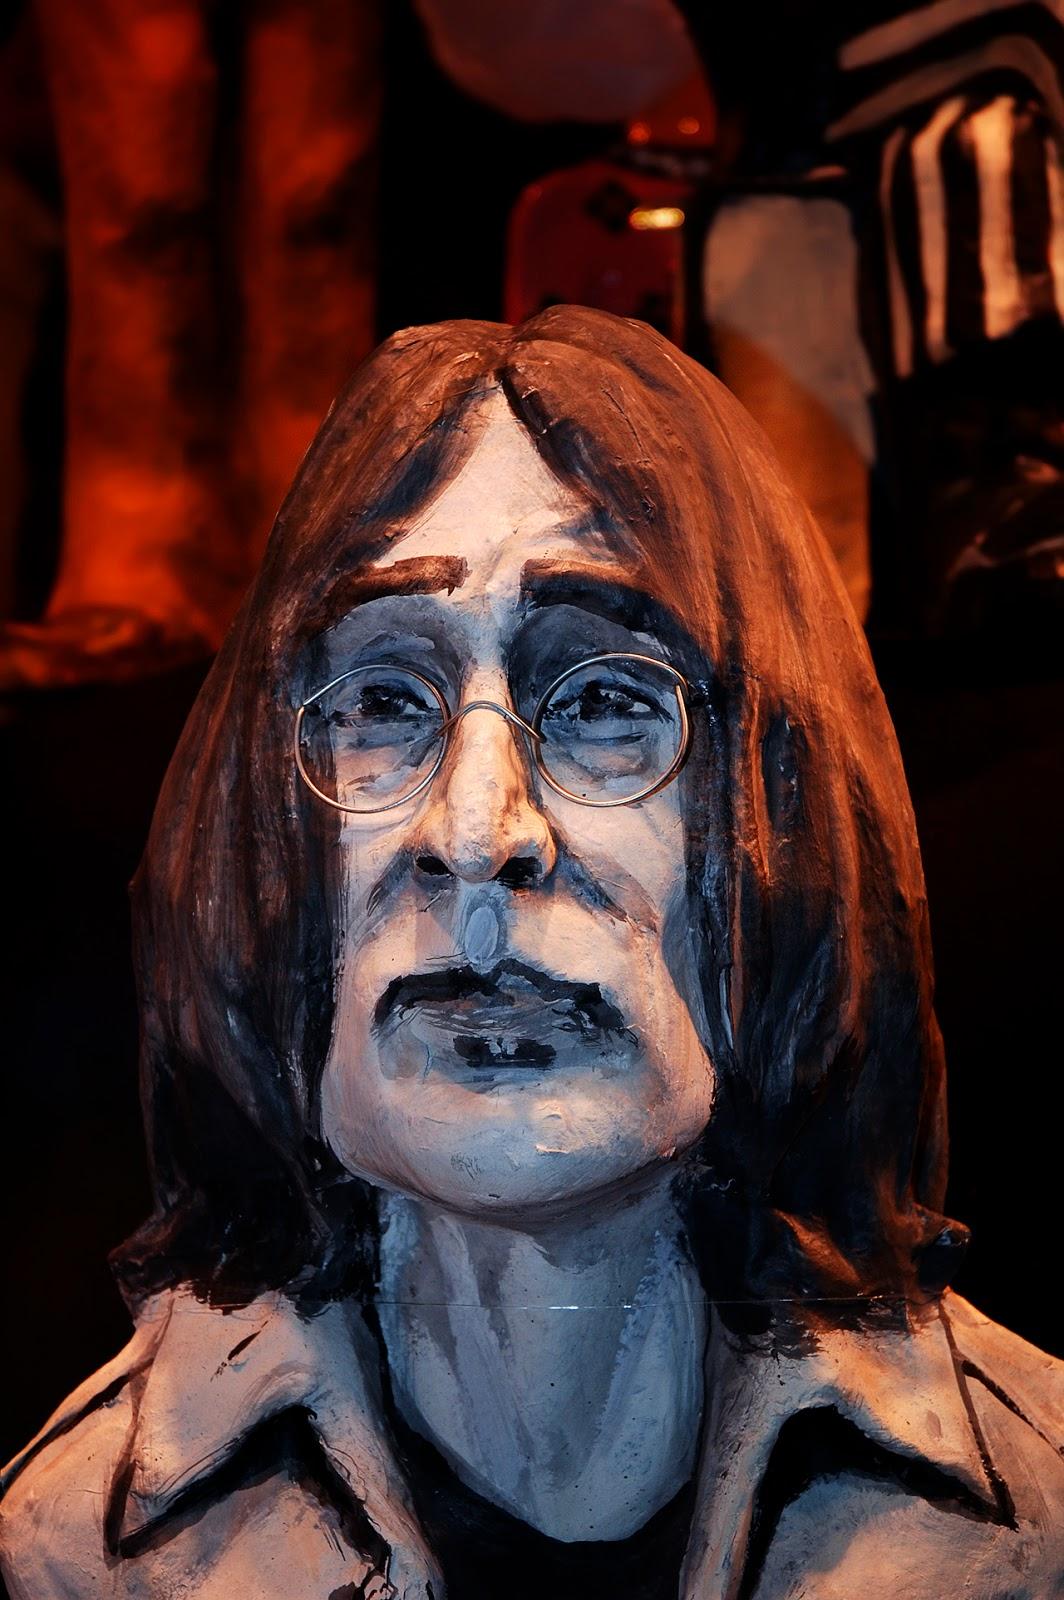 John Lennon in Papier Mache, Barcelona